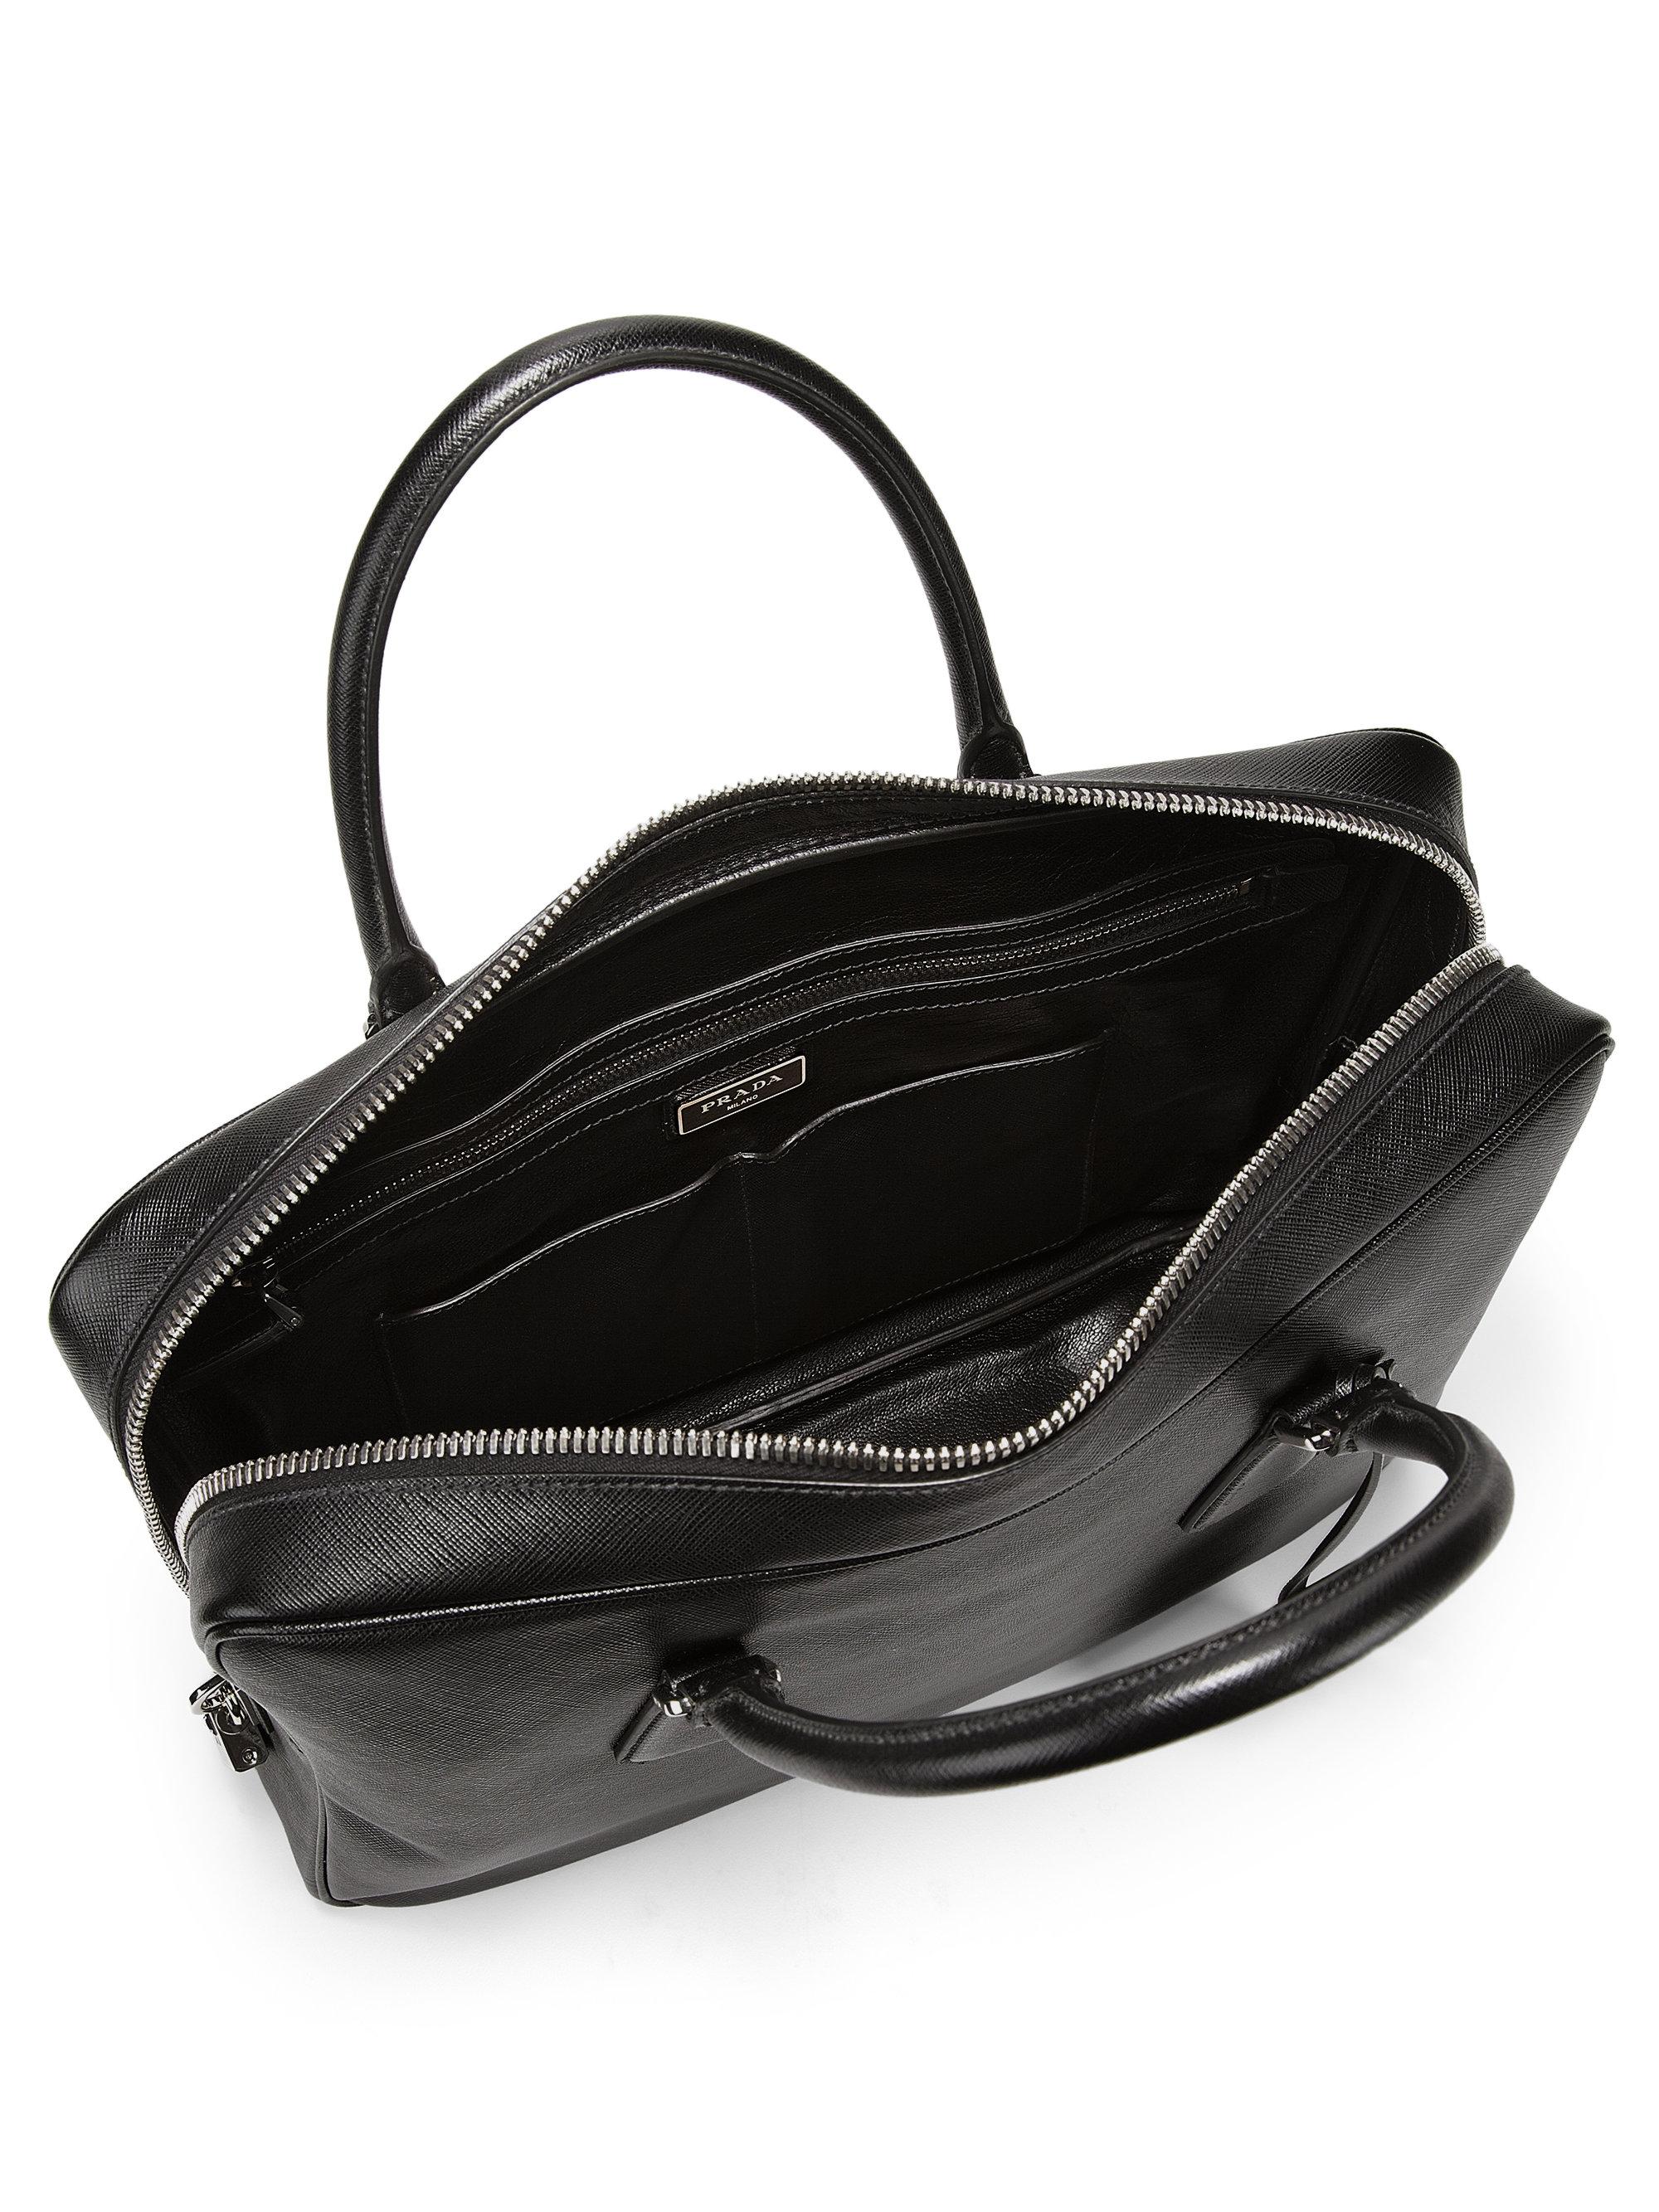 prada red flower bag - Prada Saffiano Leather Briefcase in Black for Men | Lyst